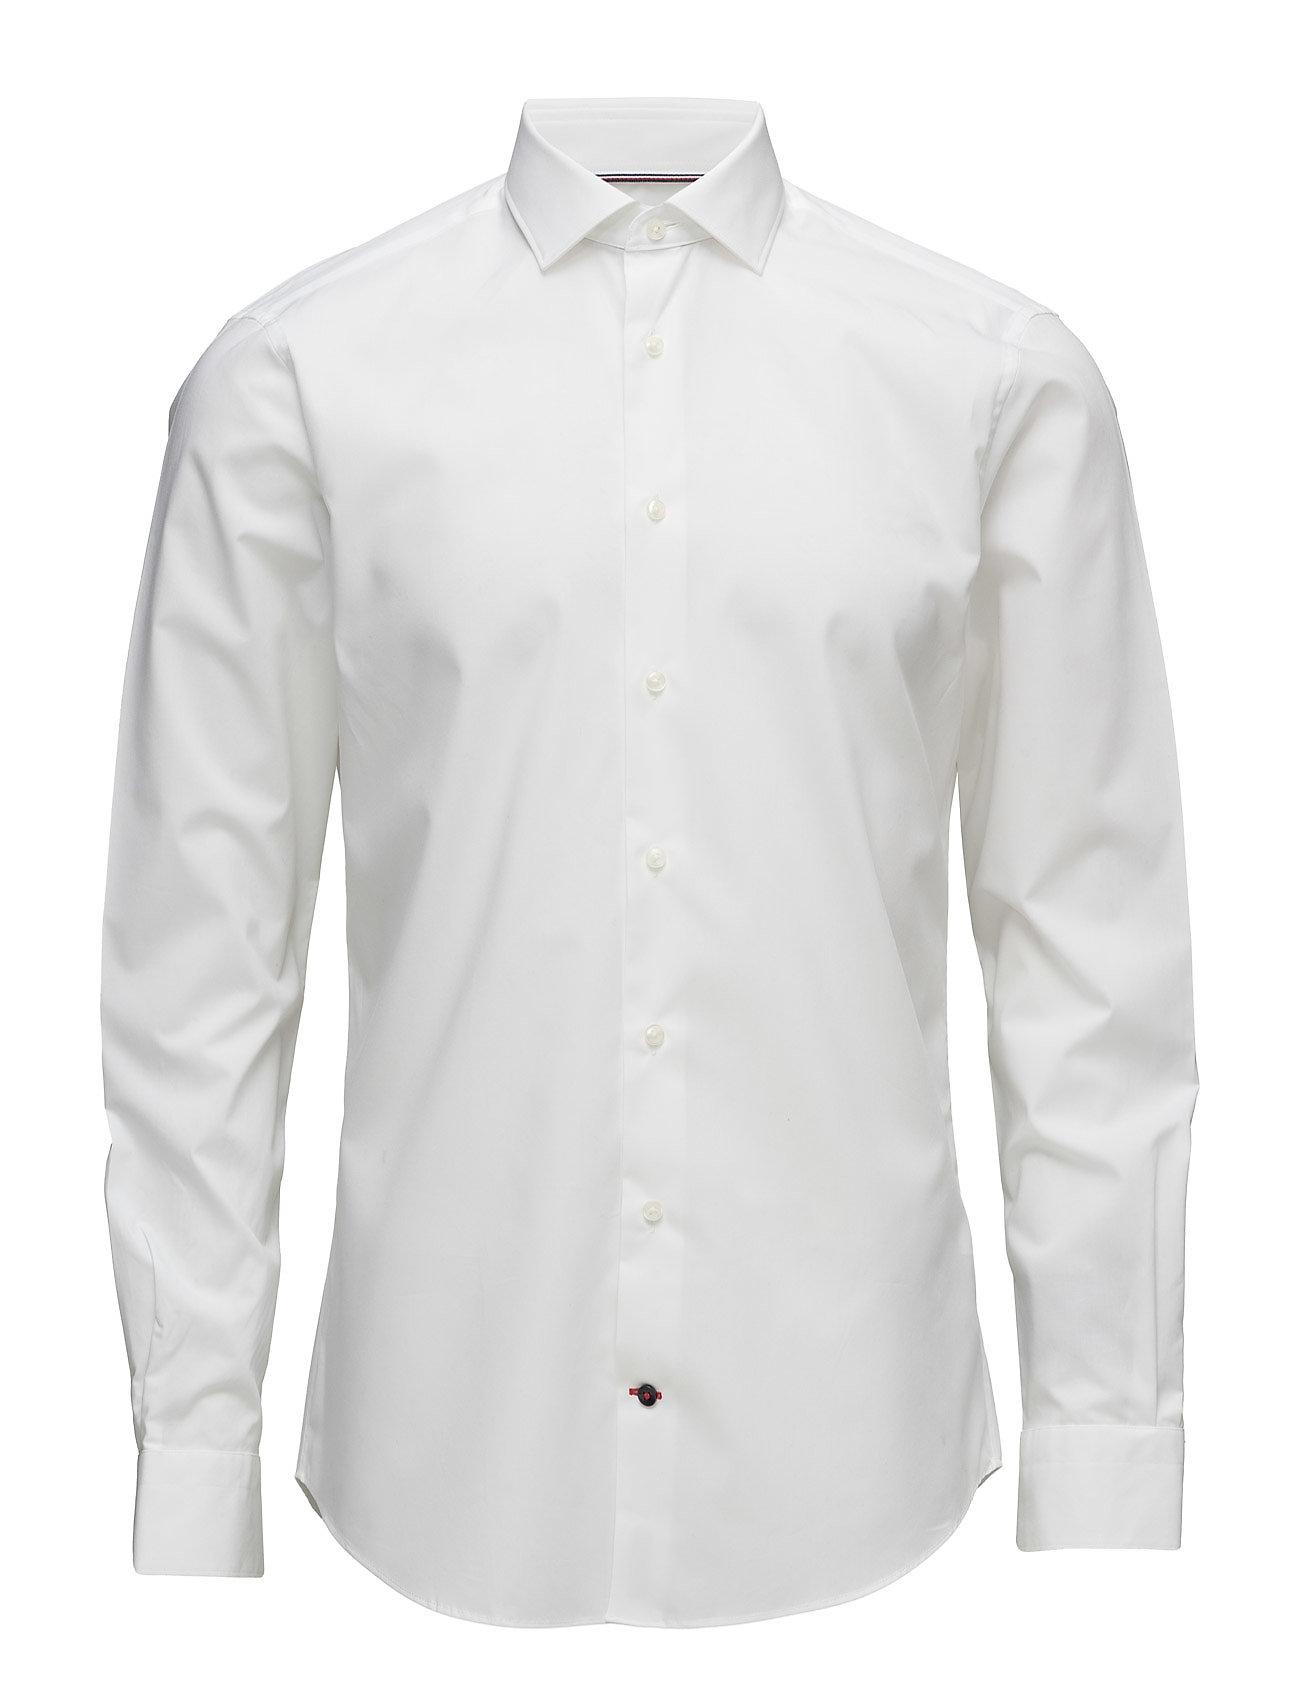 Tommy Hilfiger Tailored CORE STRETCH POPLIN SLIM SHIRT - WHITE